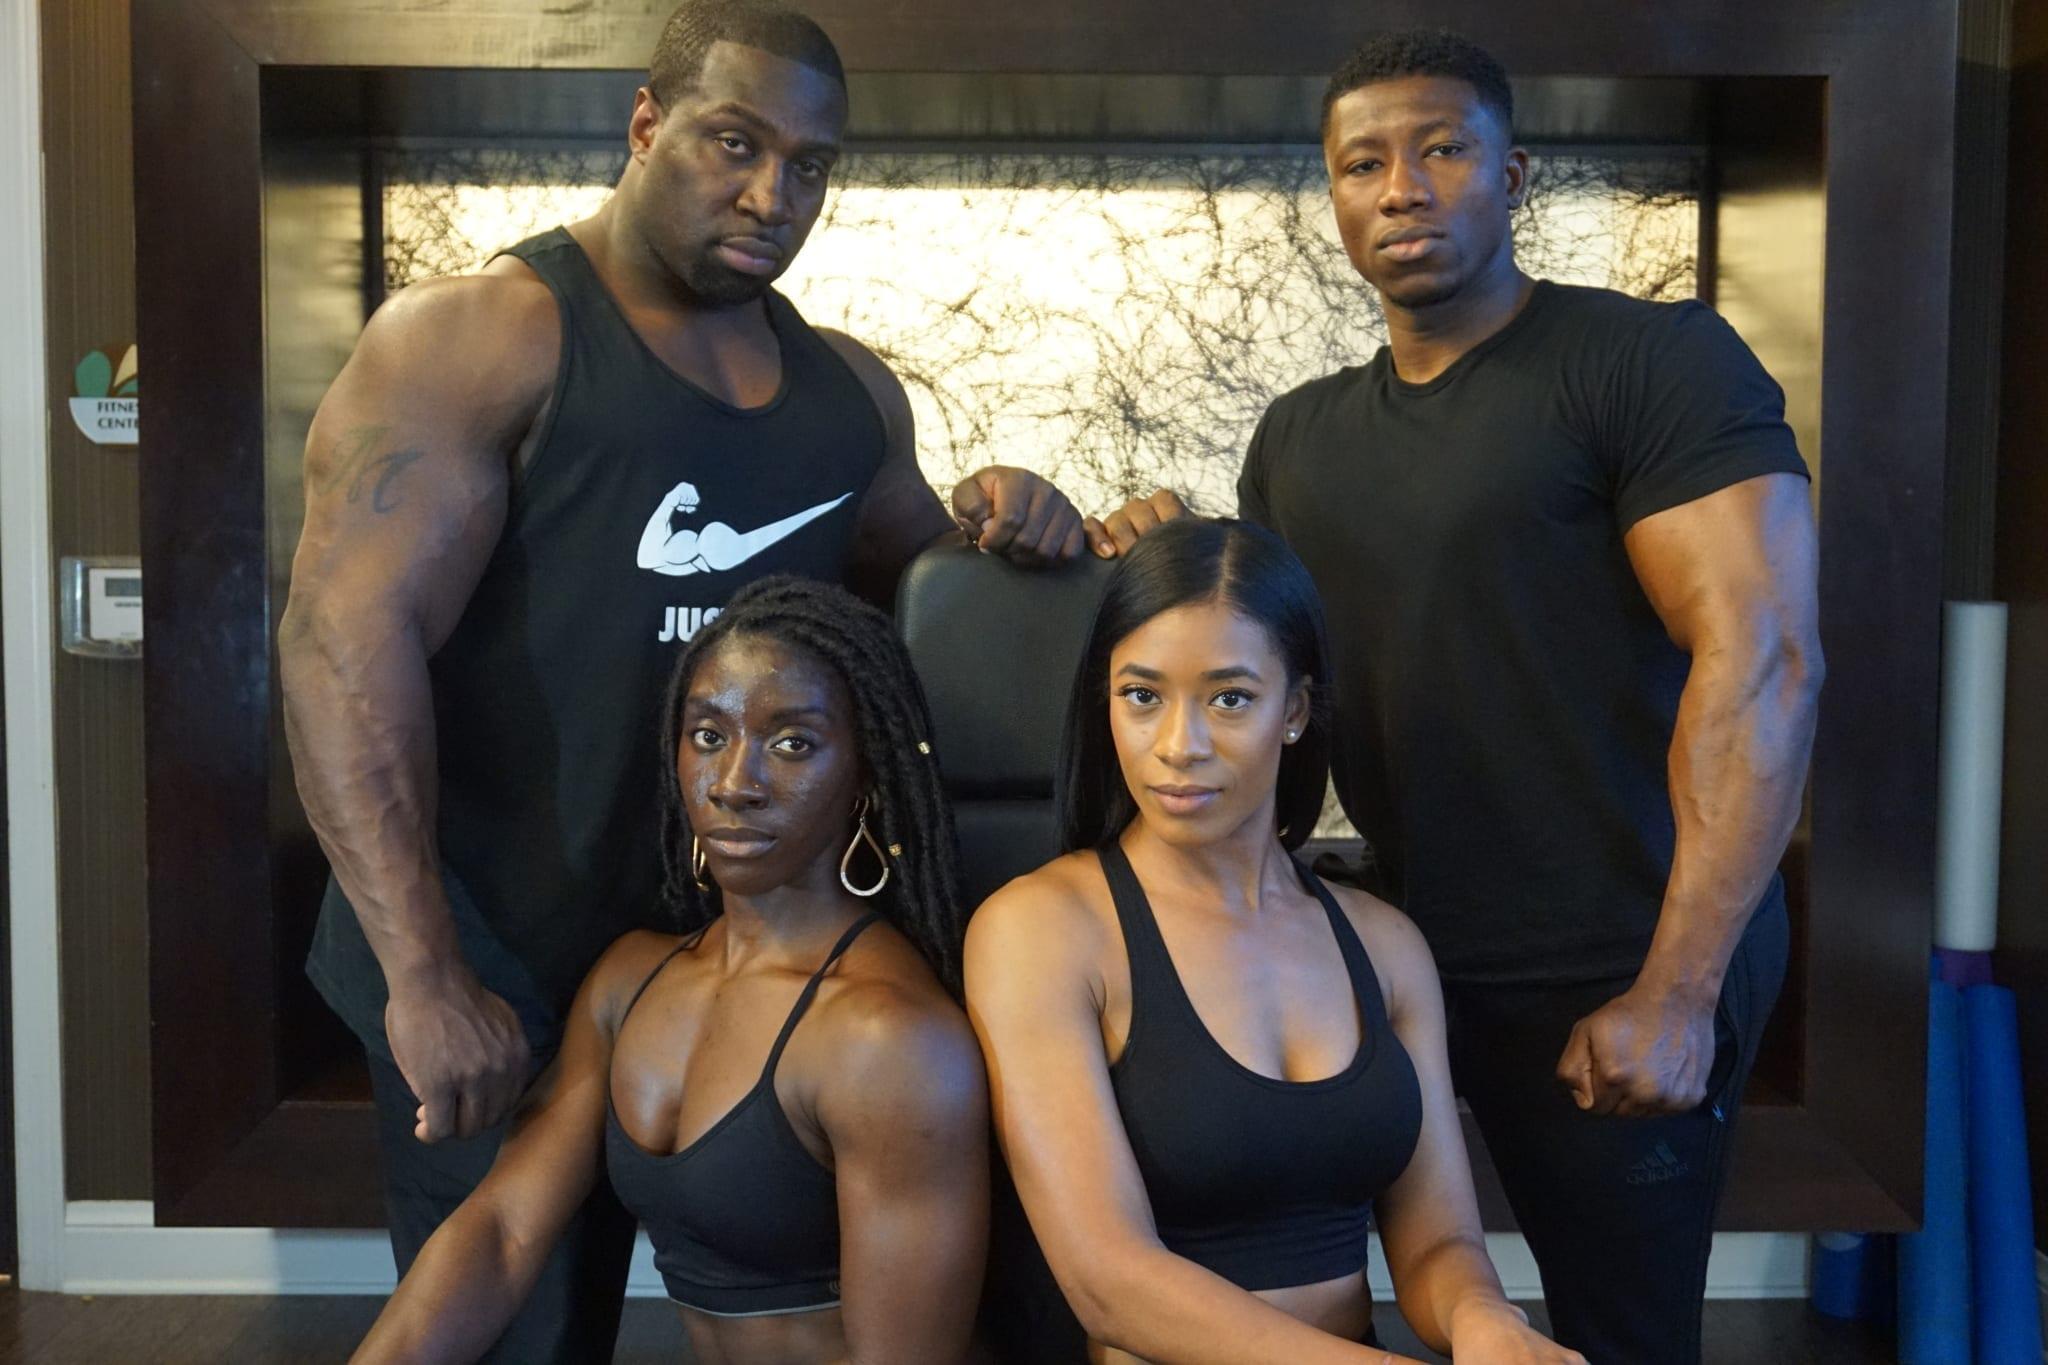 Black bodybuilders bdsm pics 36